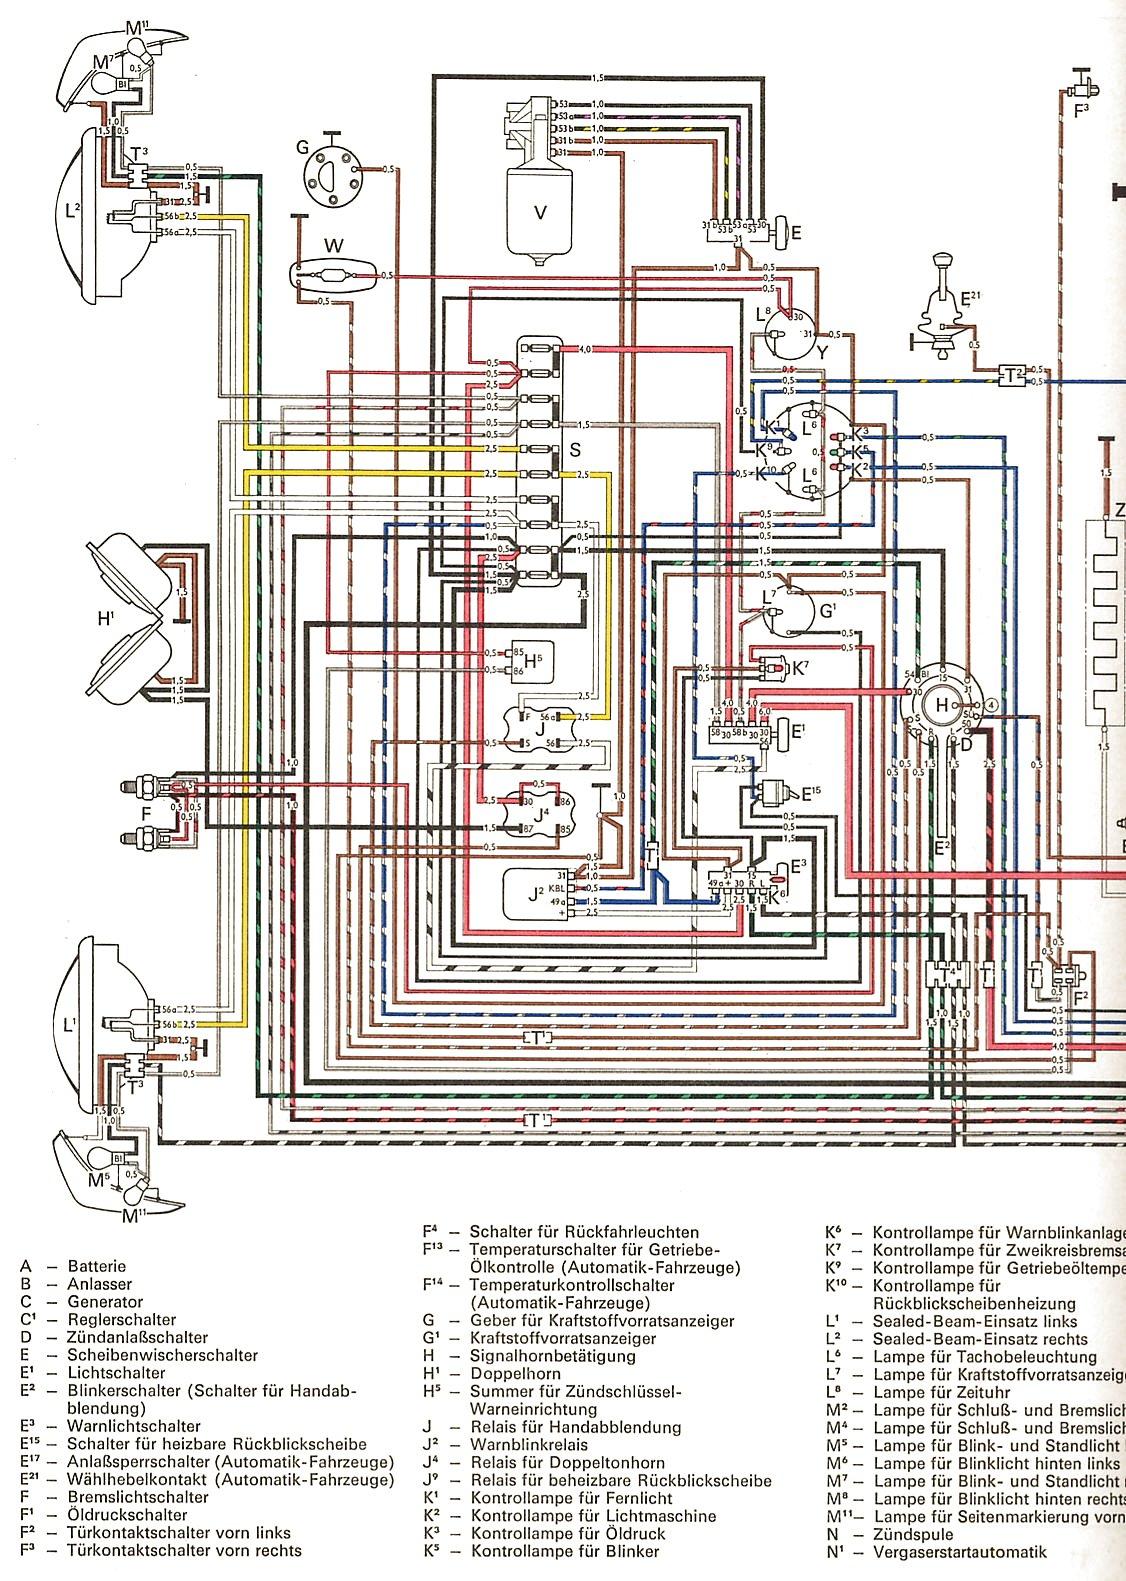 kl_6582] 1986 fiat x1 9 instrument cluster fuse box diagram schematic wiring  alma sheox mohammedshrine librar wiring 101